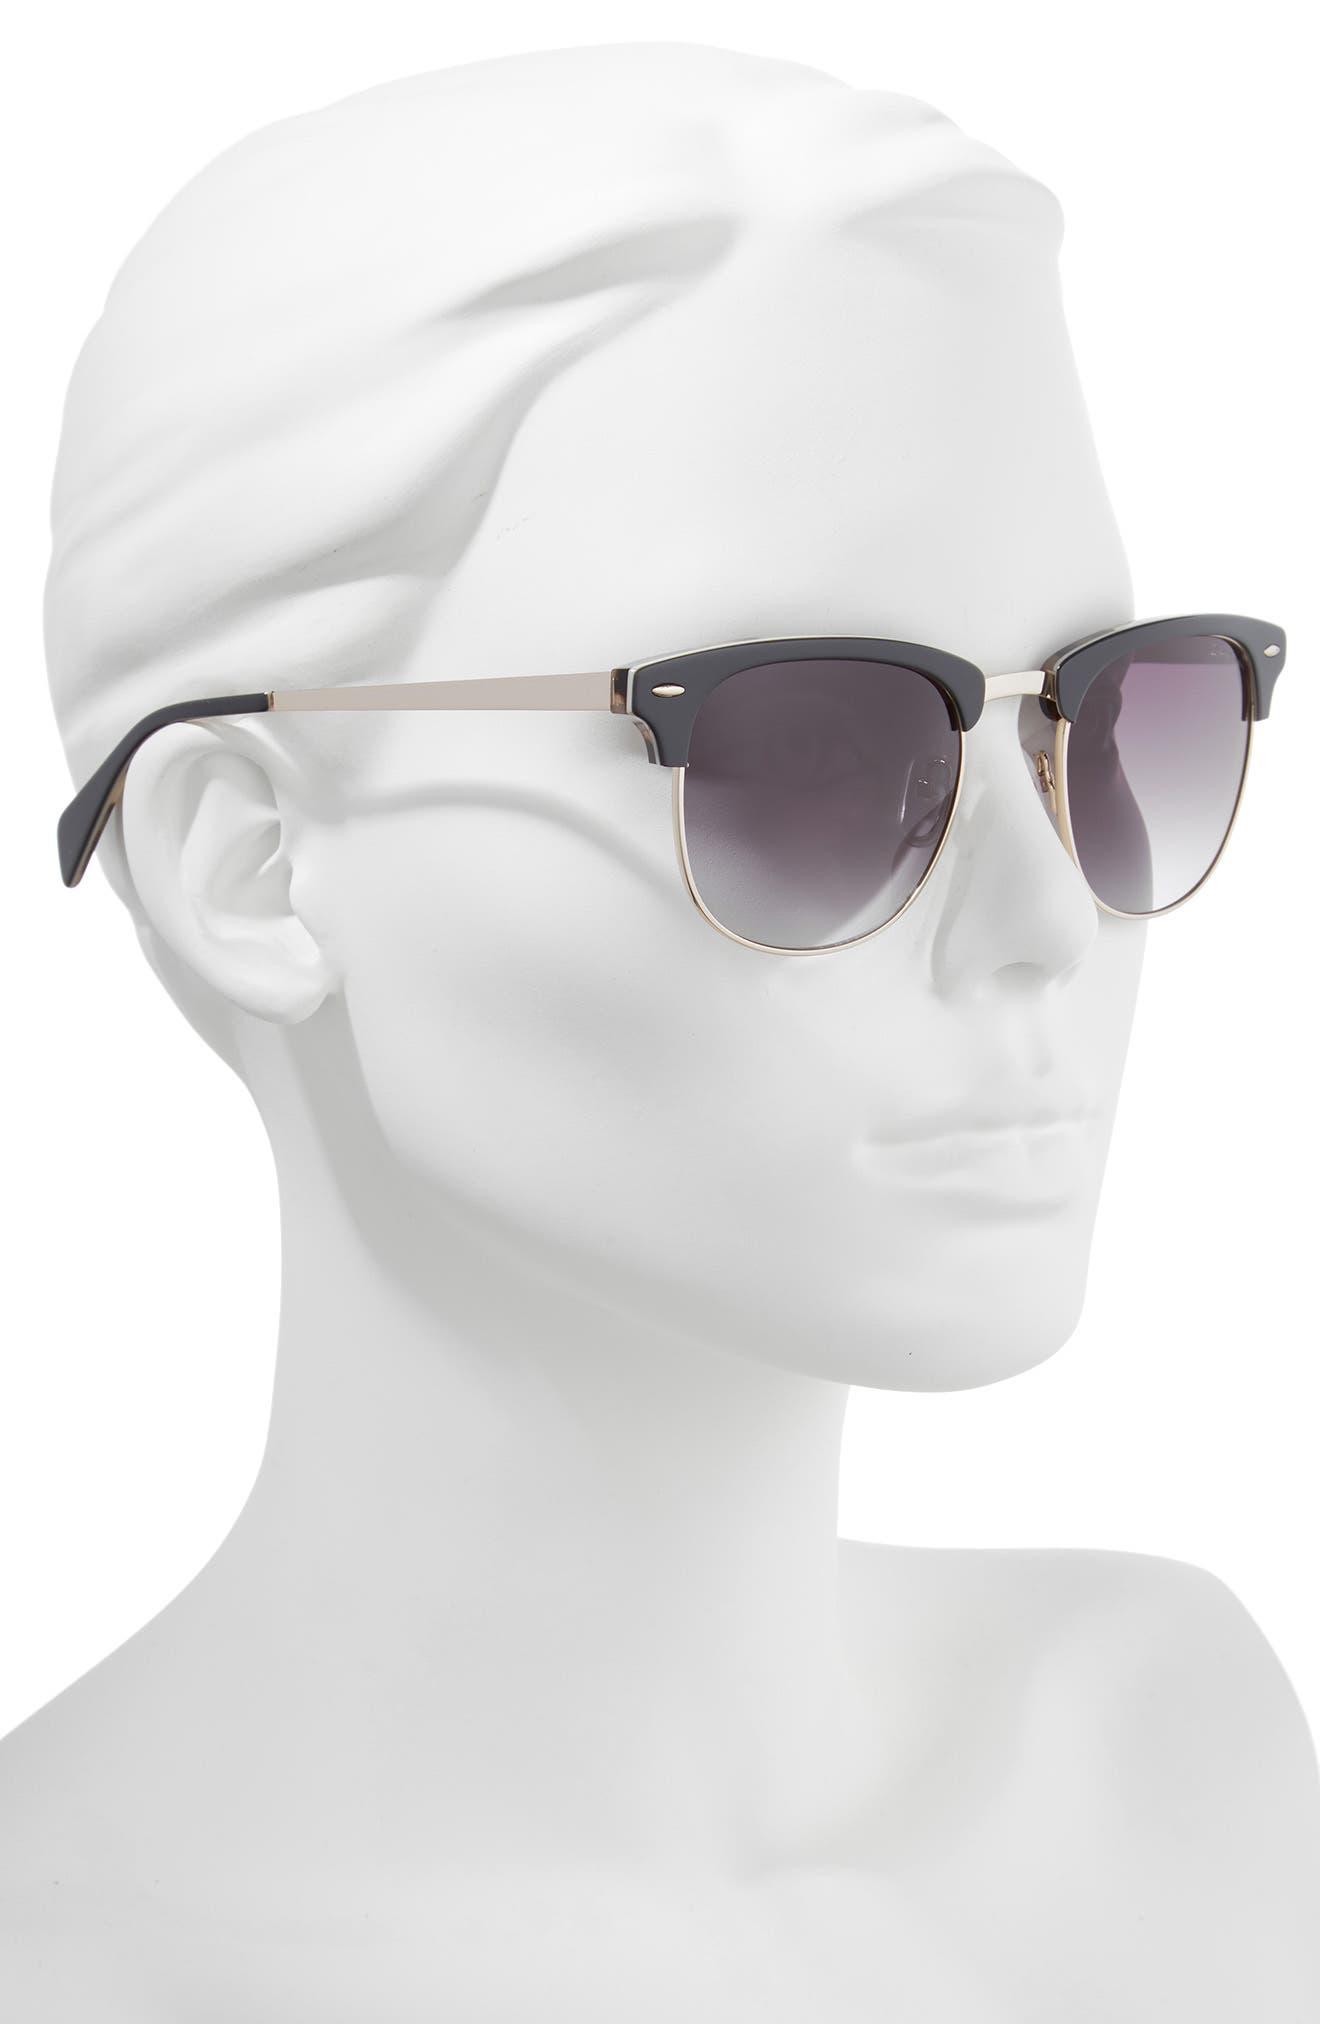 55mm Sunglasses,                             Alternate thumbnail 2, color,                             GREY